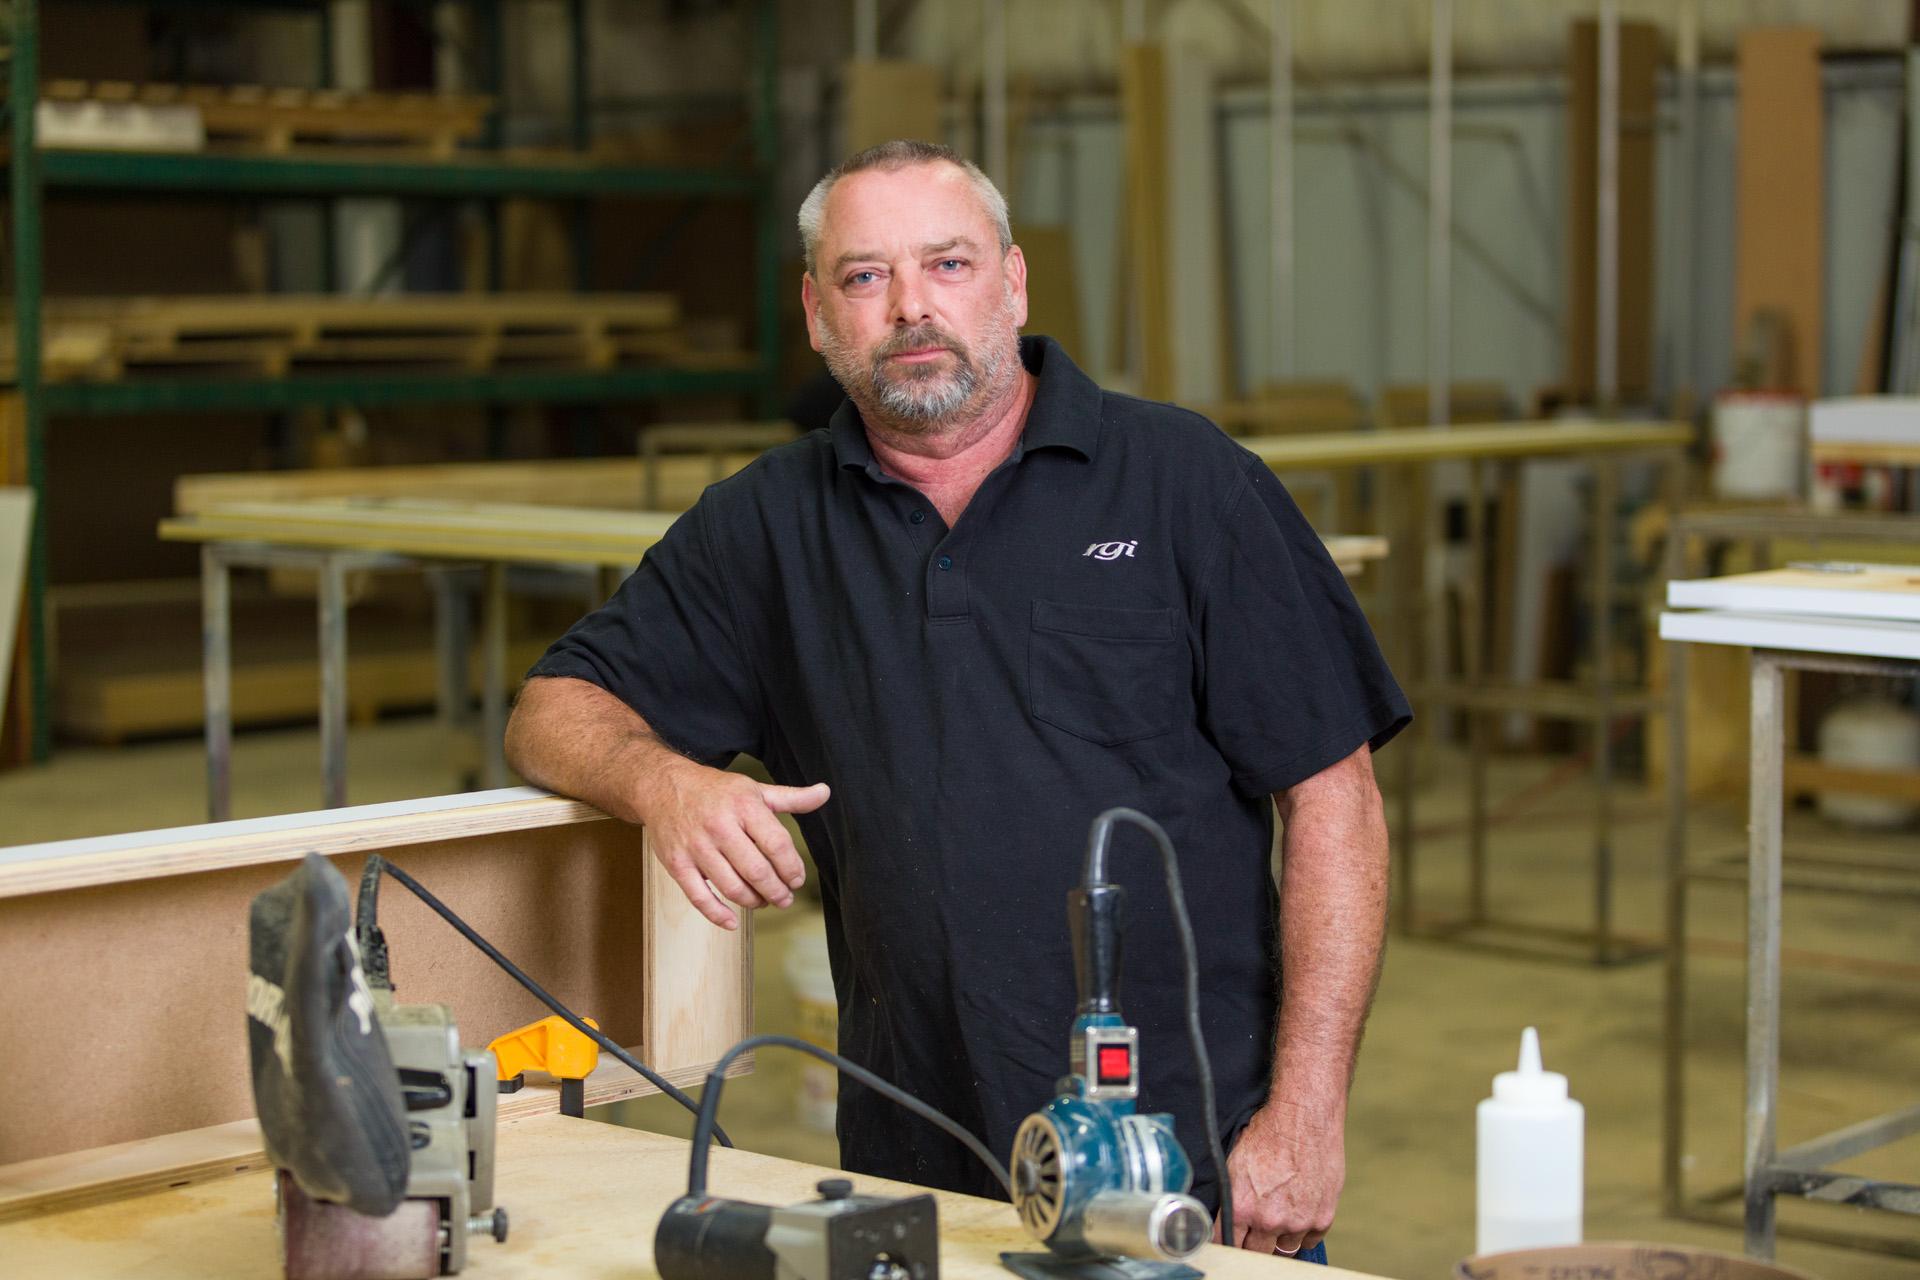 Dave Pranke, Fabrication